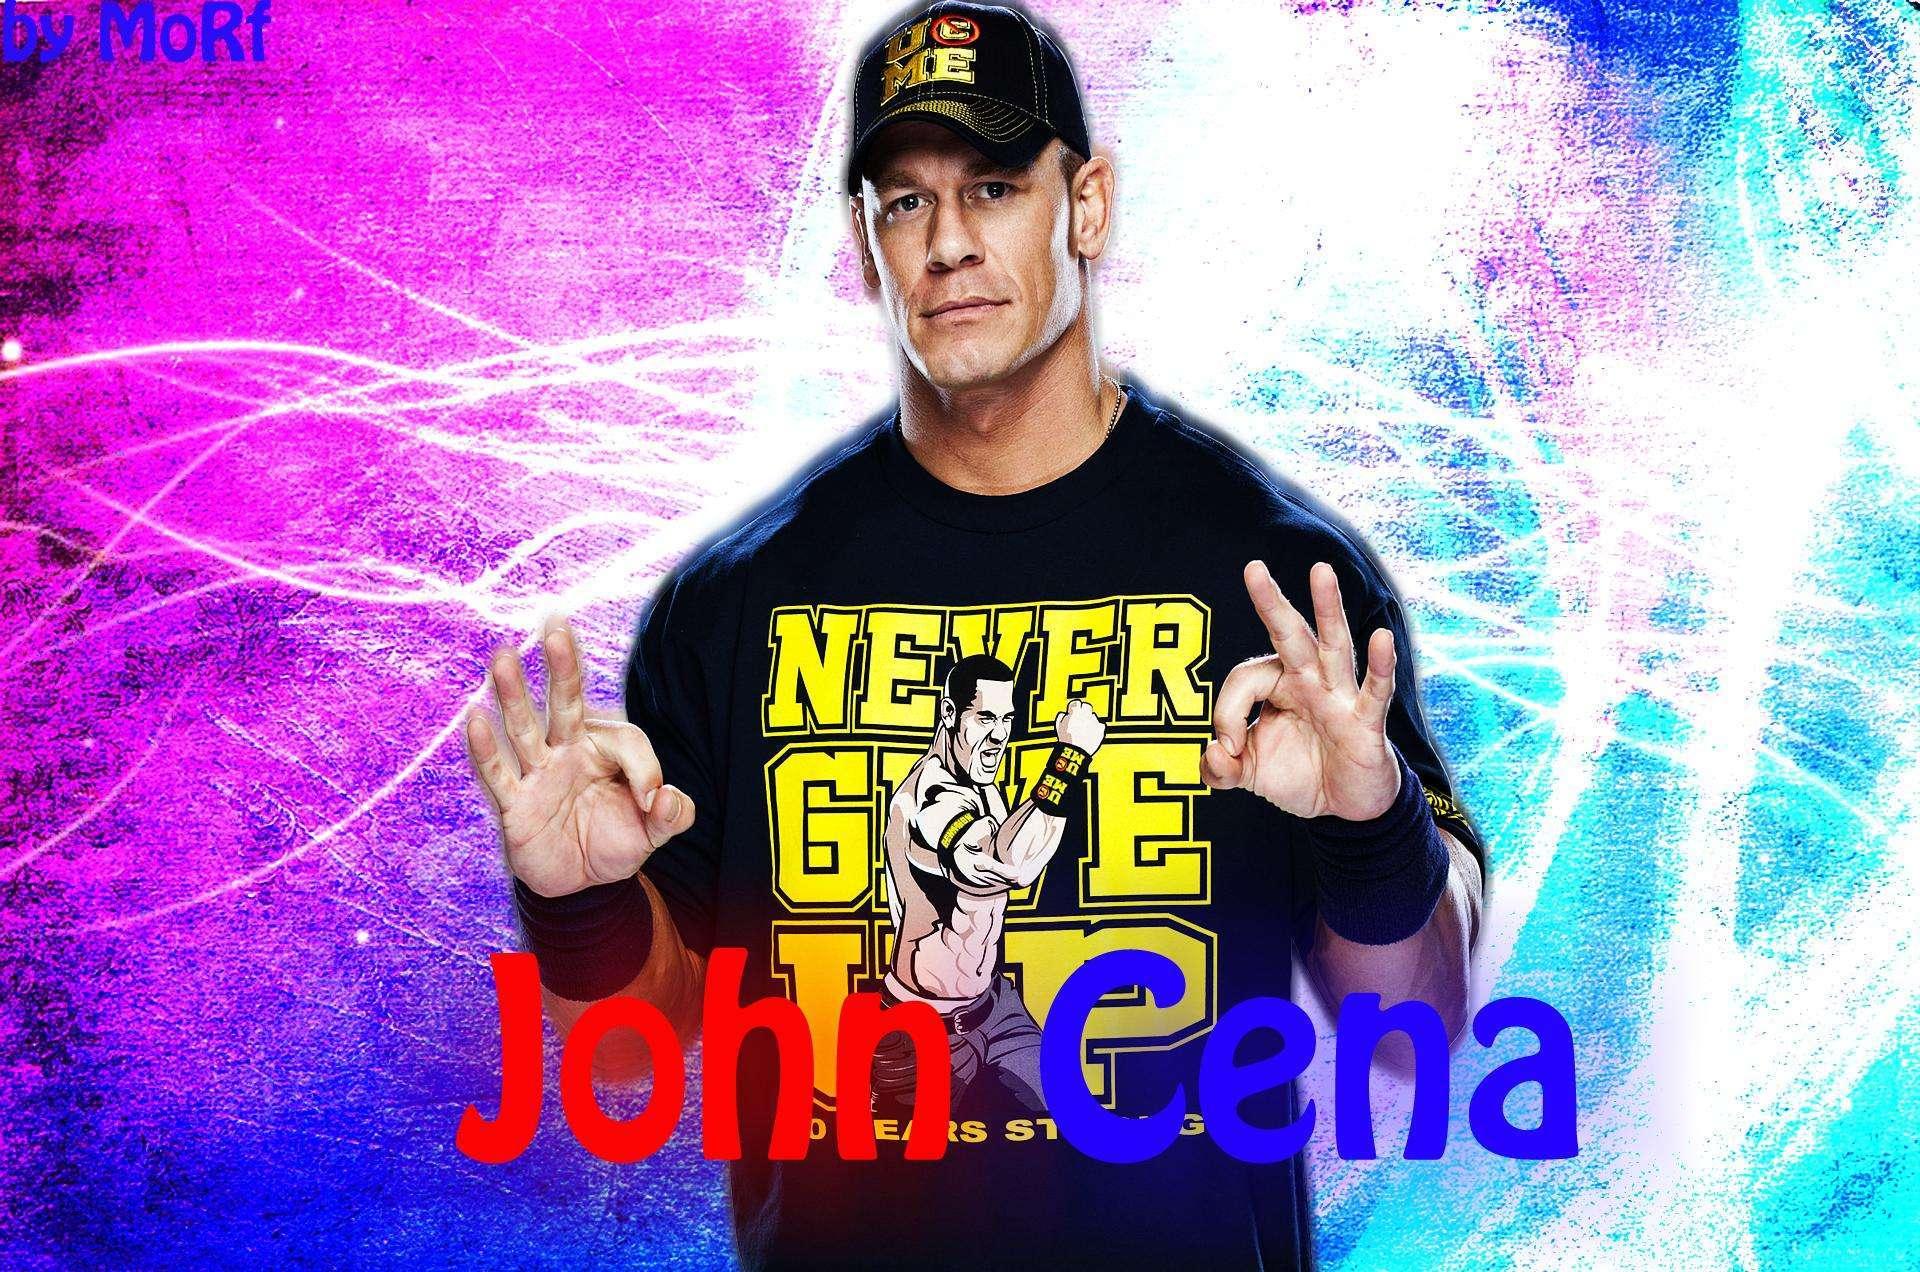 WWE John Cena Wallpapers 2016 HD